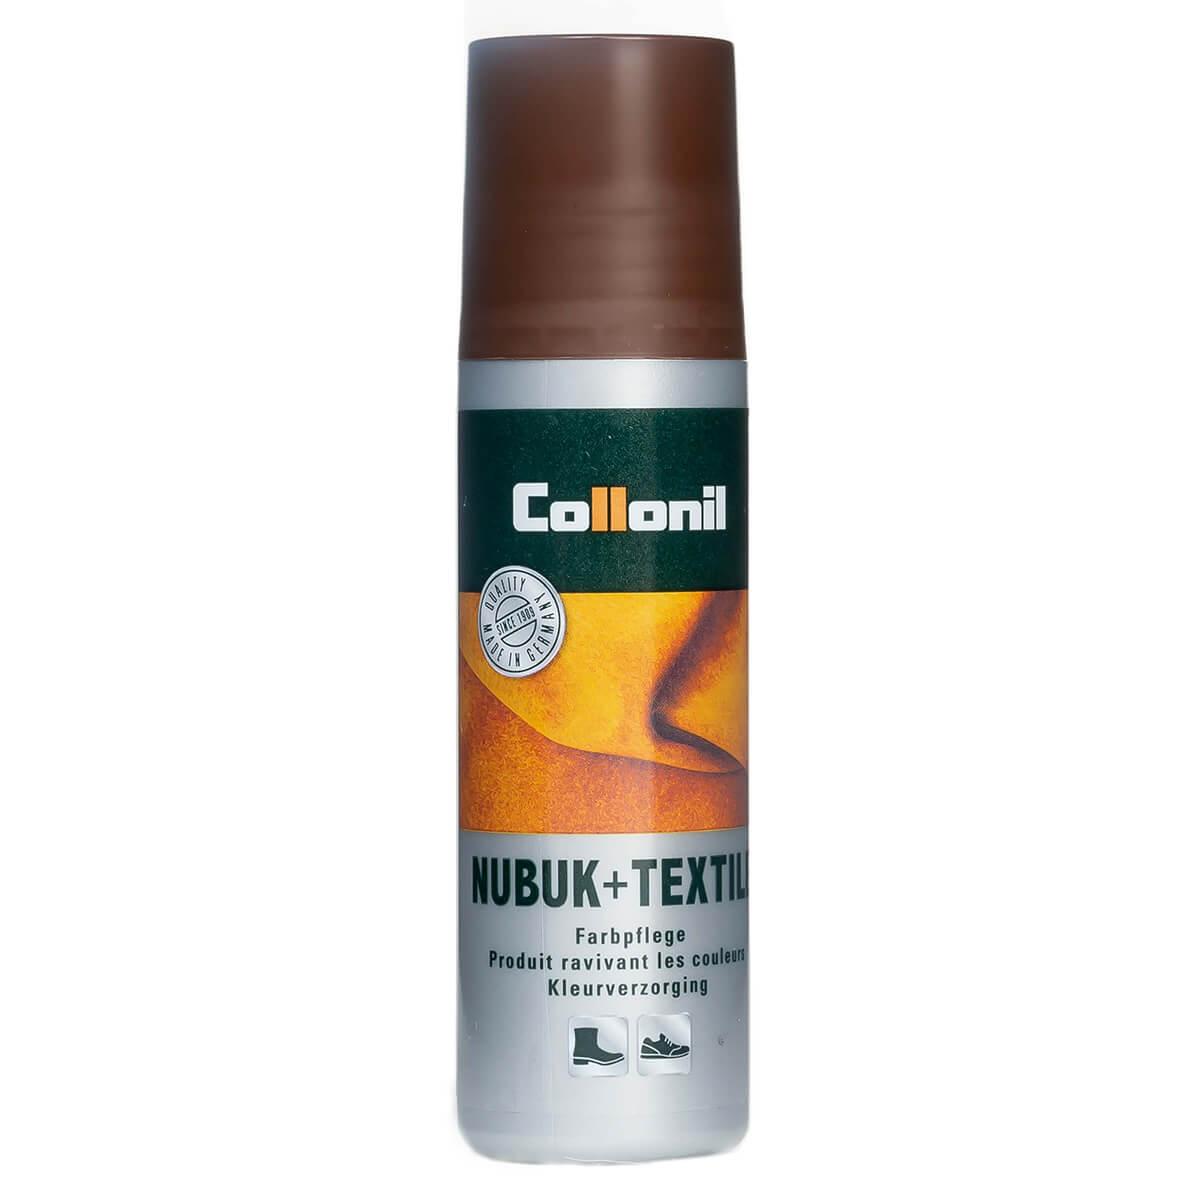 Collonil Nubuk Textile Farbpflege Farbe Taupe Collonil Und: Collonil Nubuk + Textile (824795-6036)